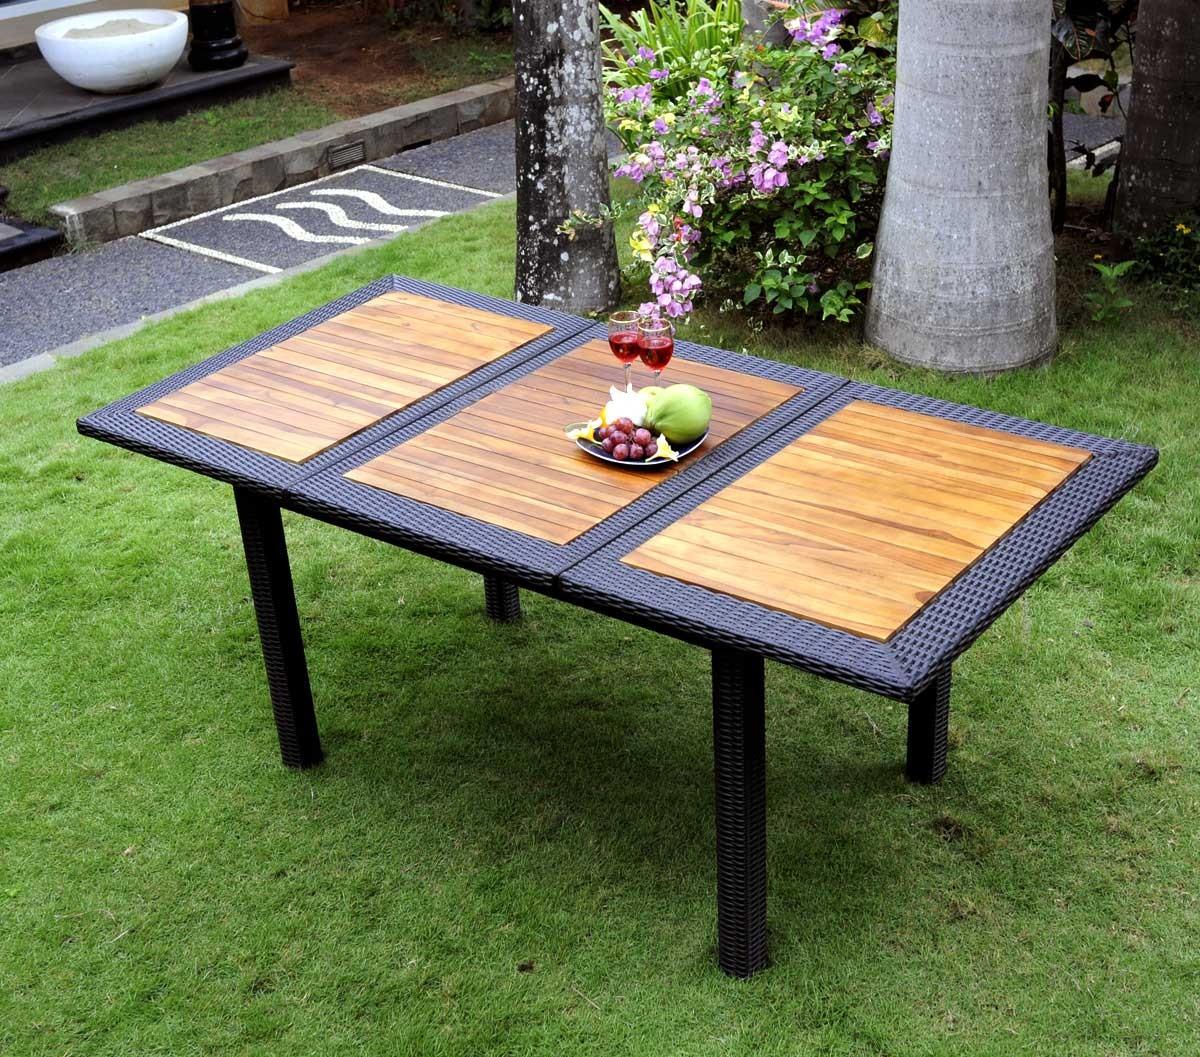 Table de jardin en teck en r sine tress e rectangulaire for Table tressee jardin